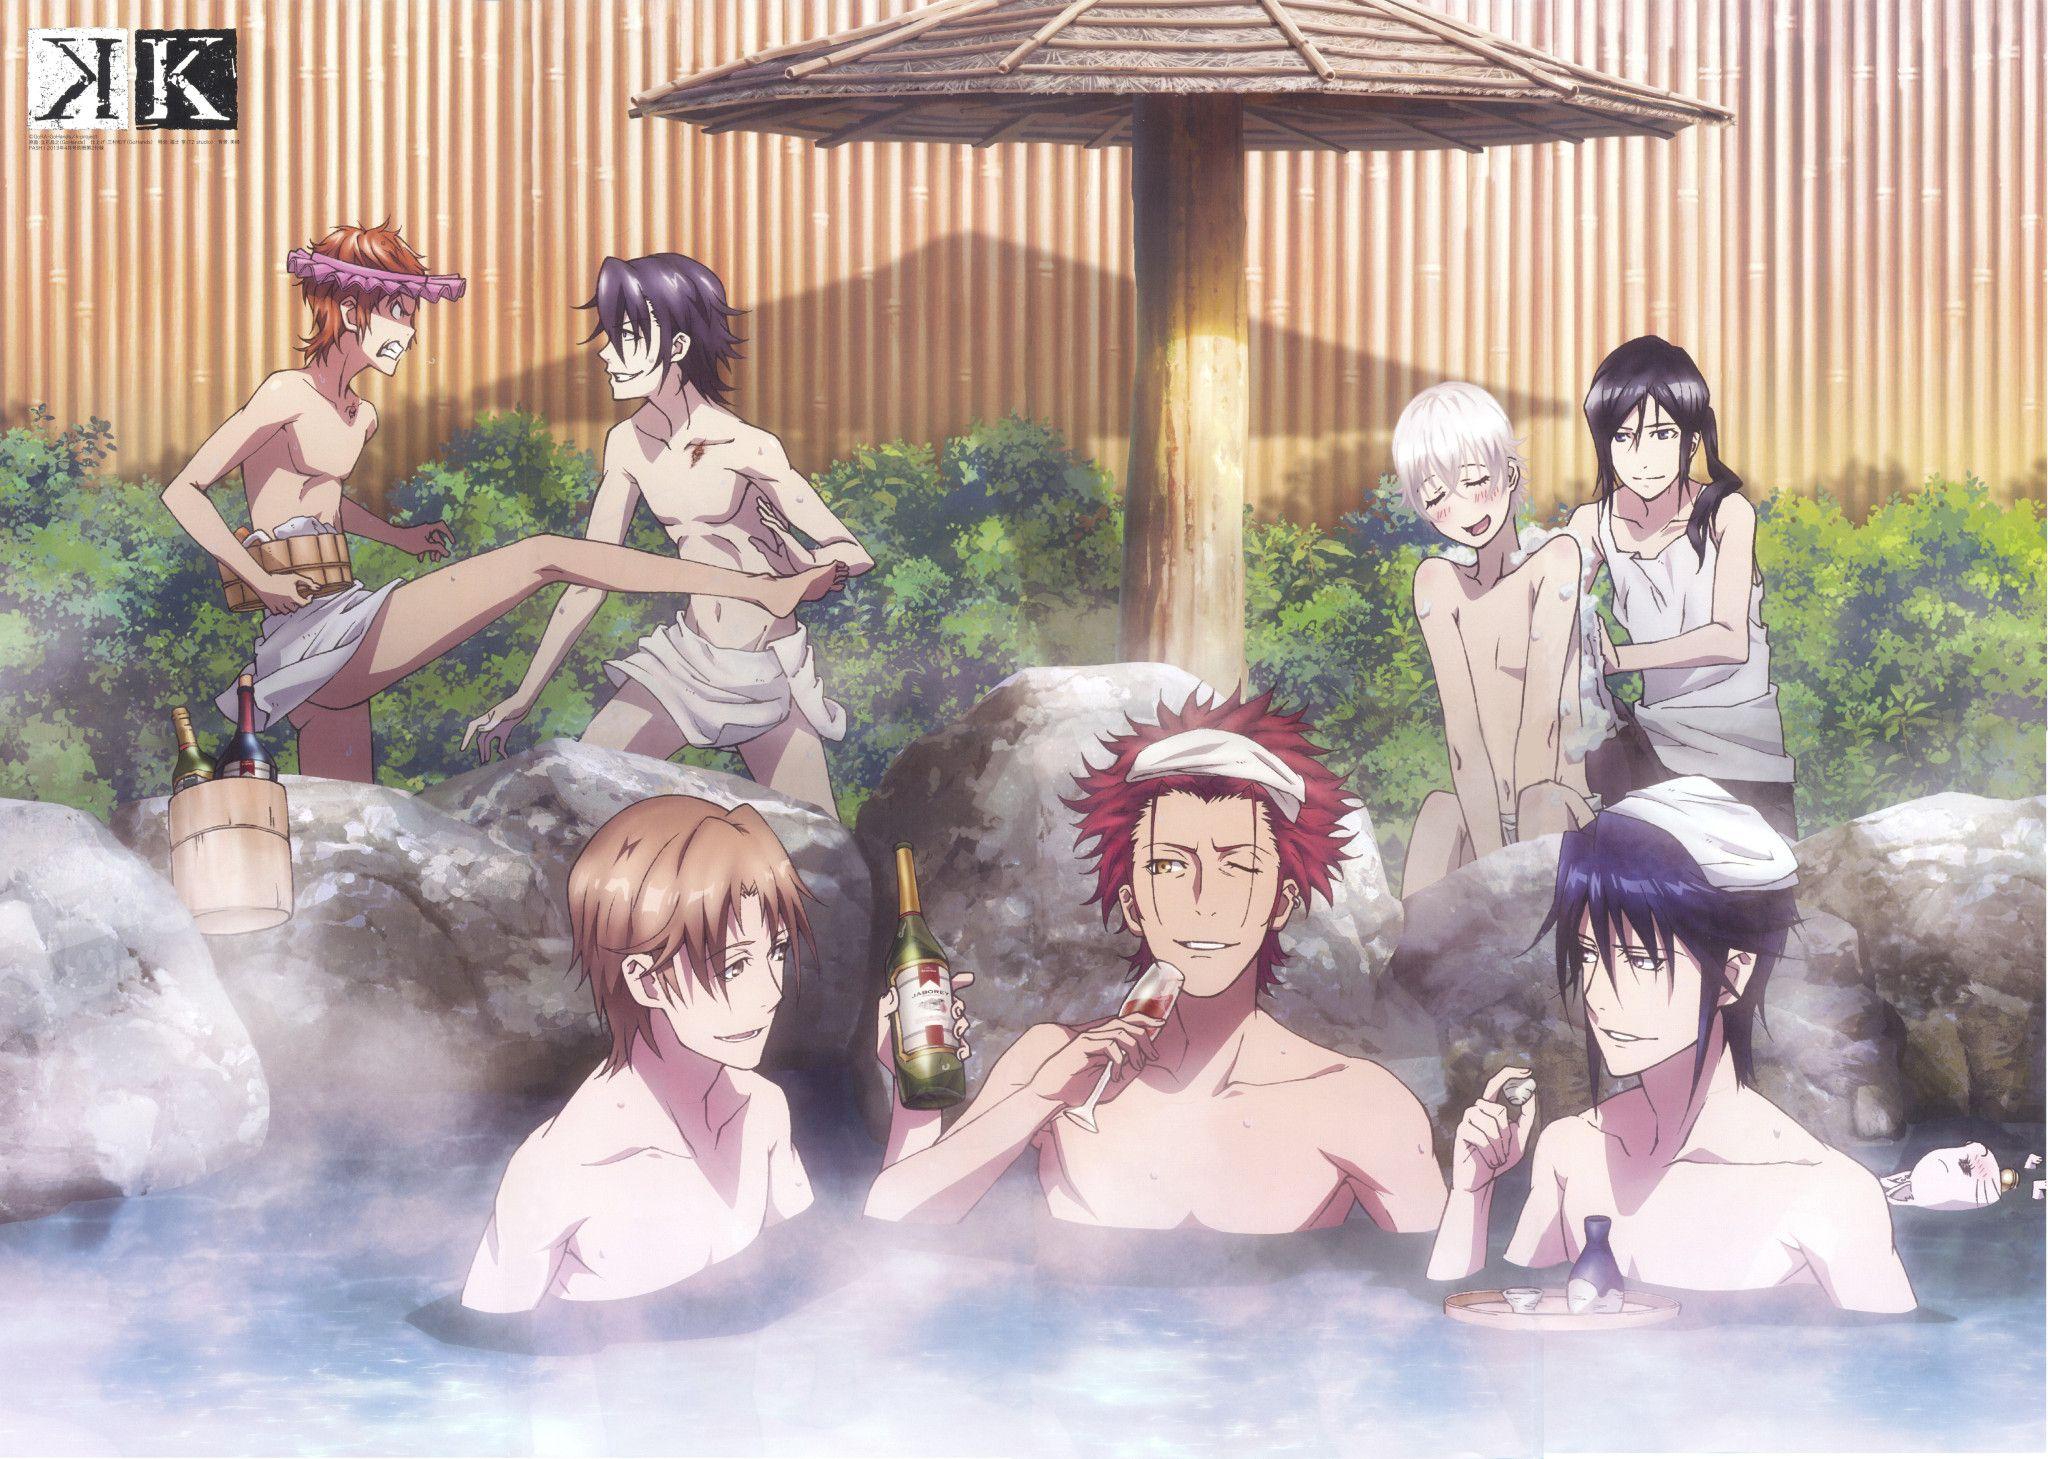 Misaki, Saruhiko, Izumo, Mikoto, Reishi, Shiro and Kuroh